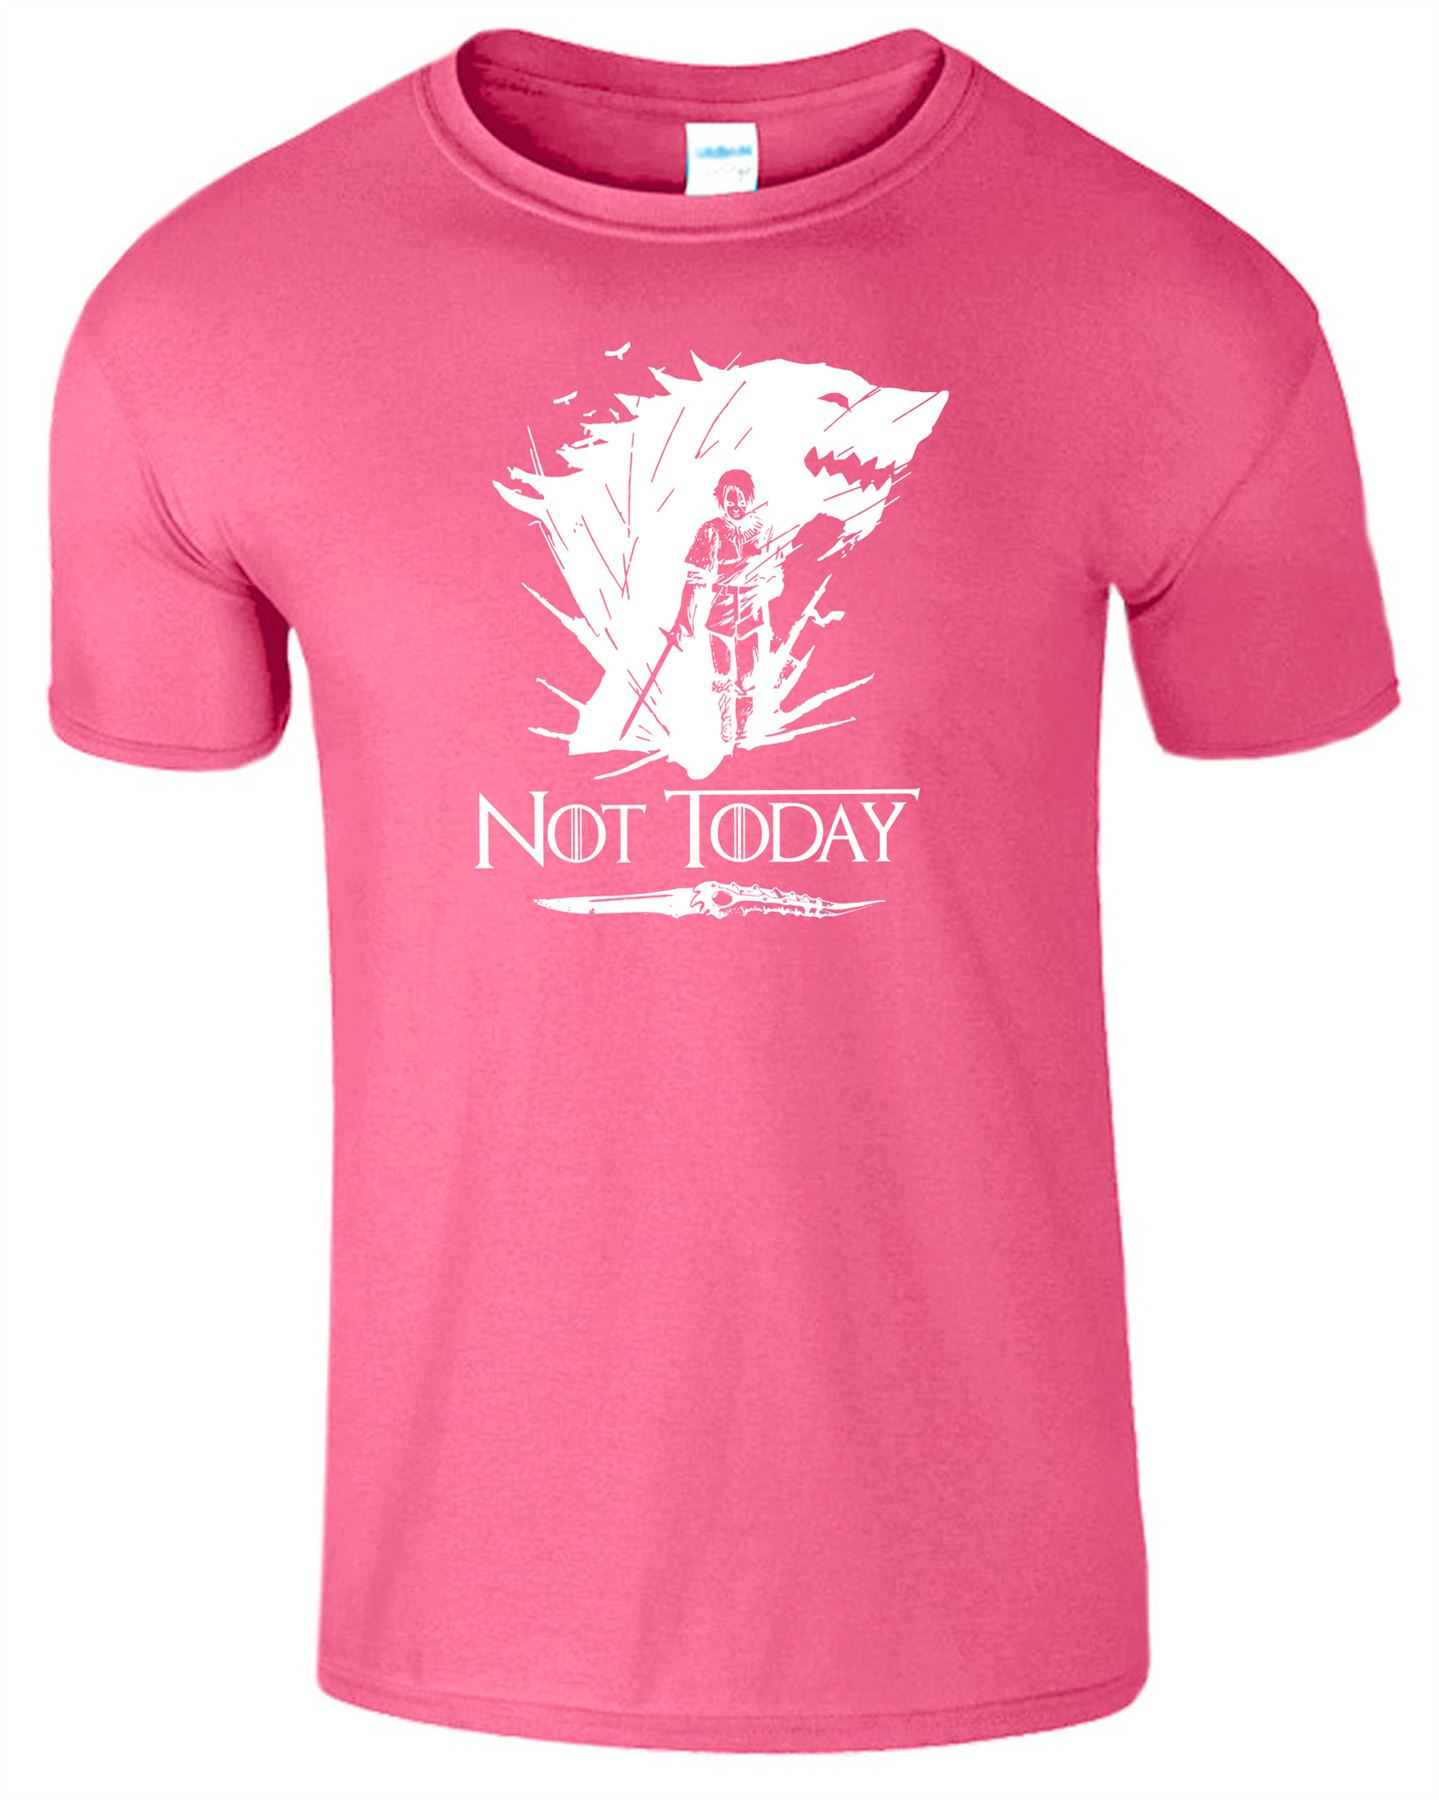 Arya-Stark-Not-Today-T-Shirt-Mens-Game-Season-Womens-Shirt-Adults-Unisex-Fit Indexbild 13